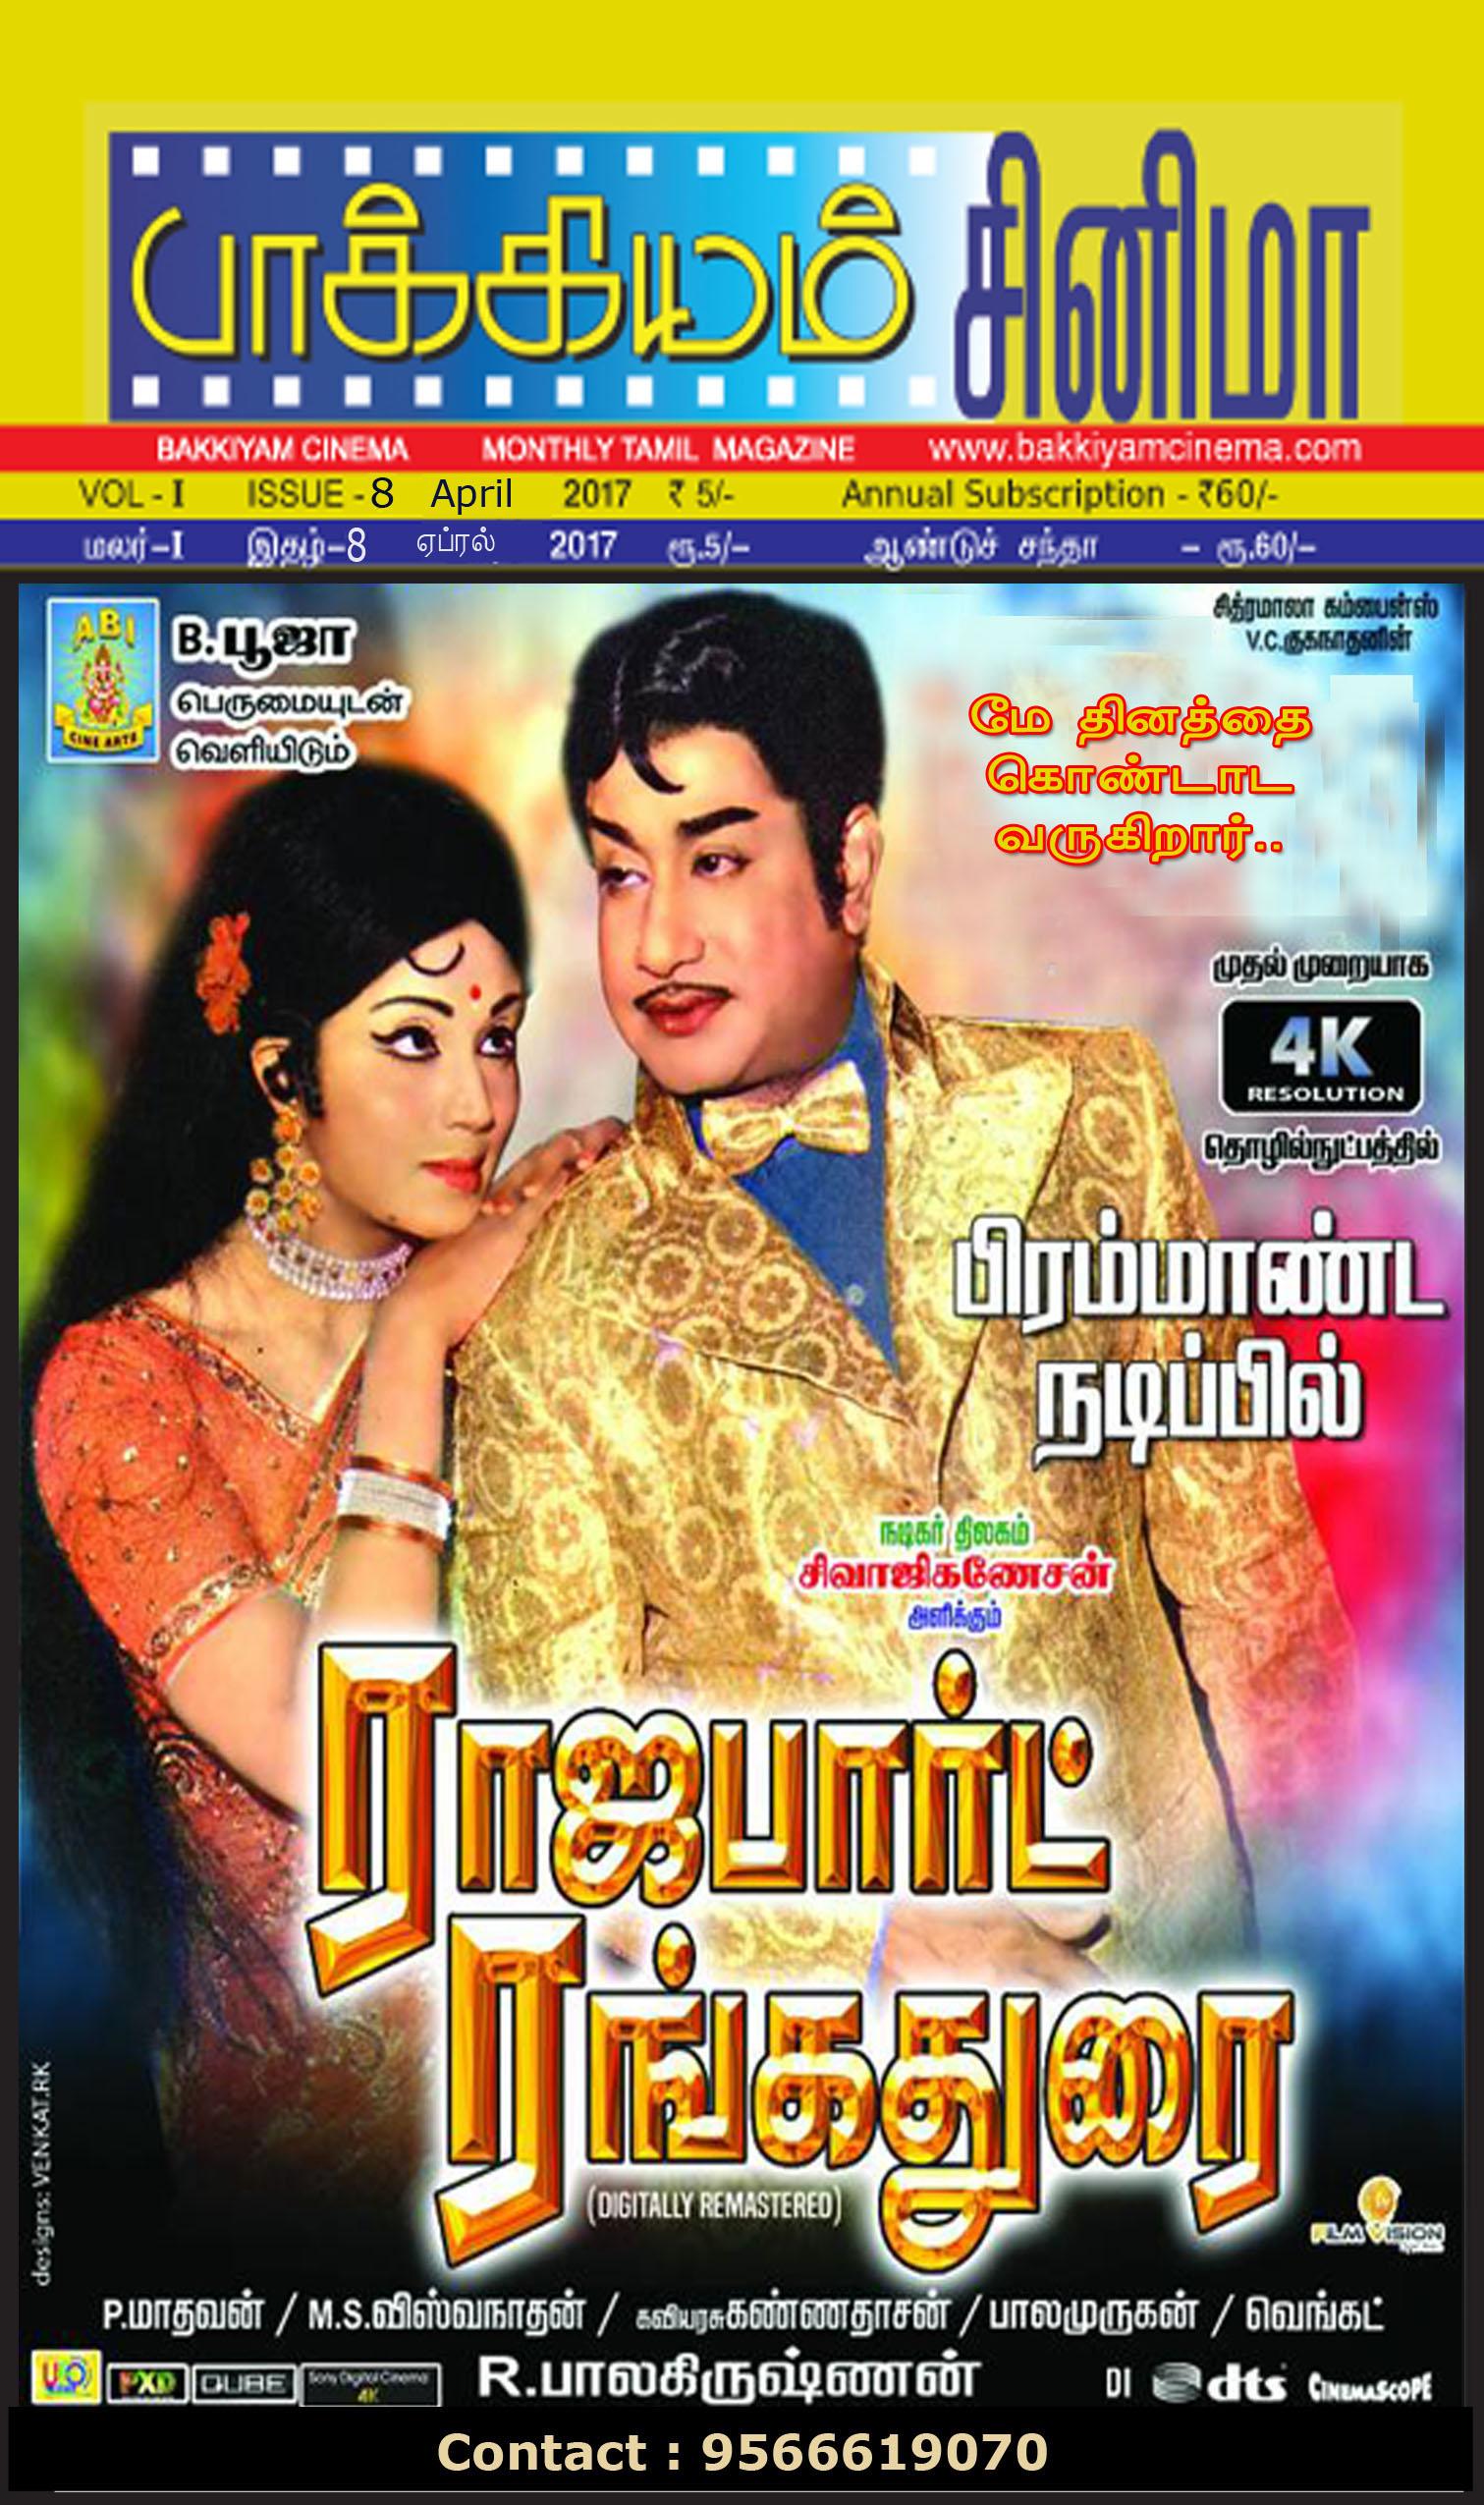 Bakkiyam Cinema – Apr 2017 Book Pages